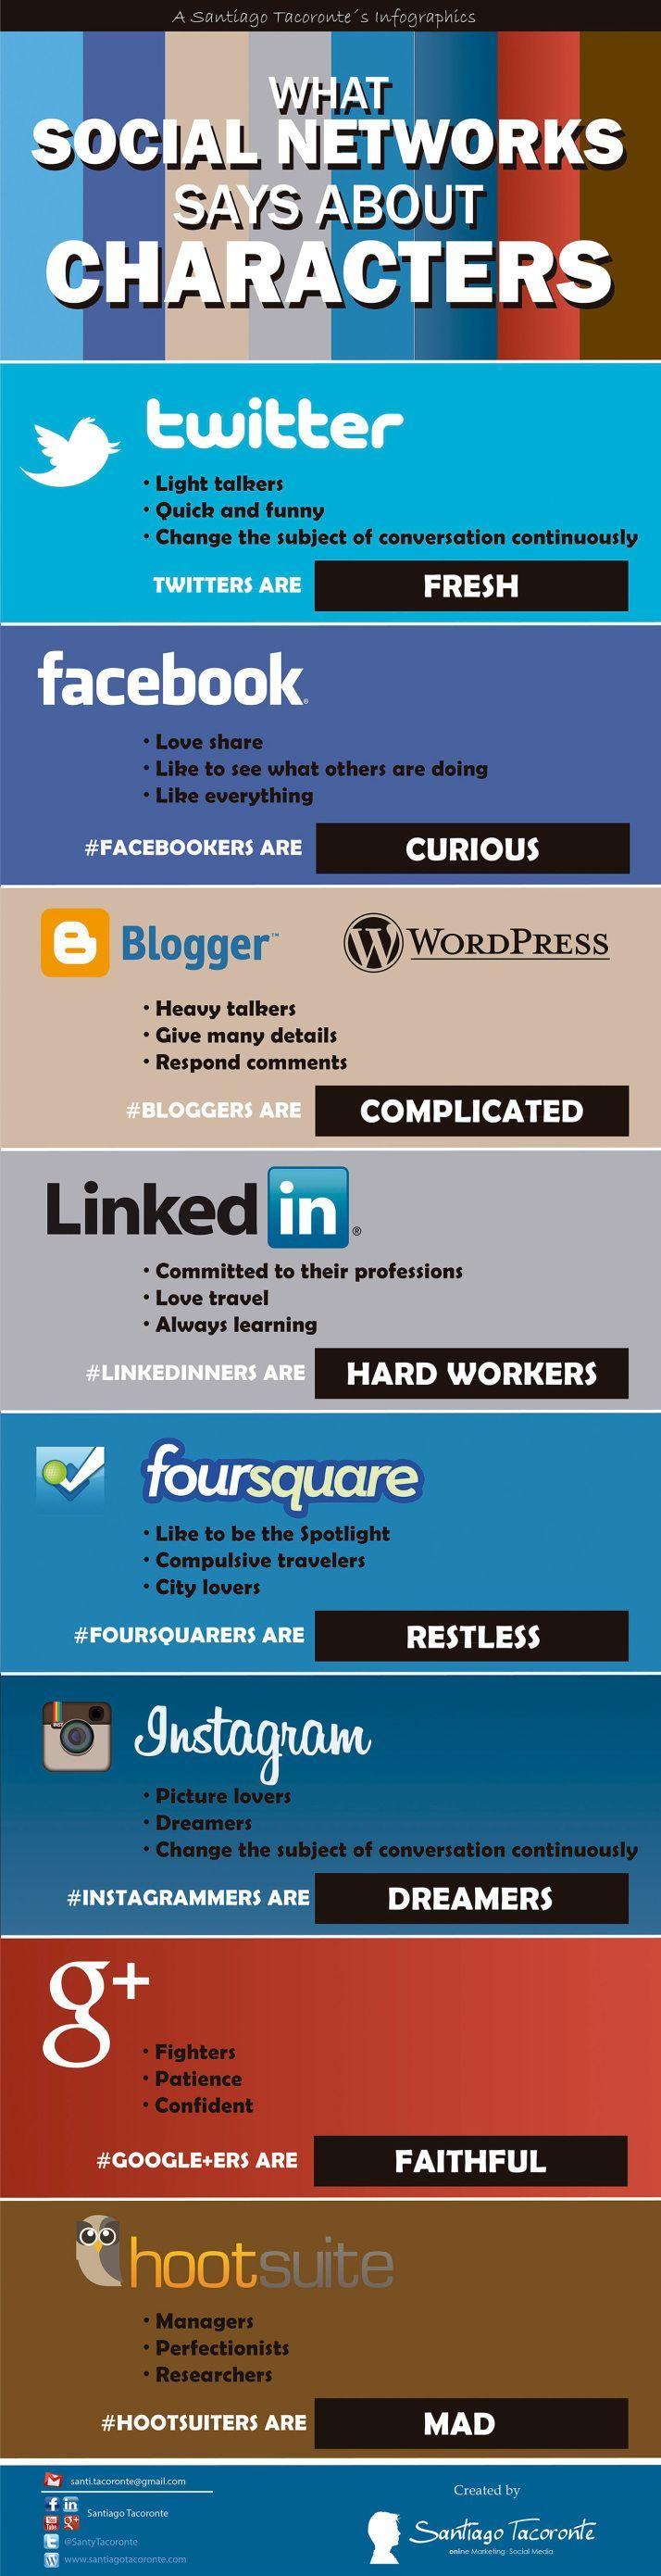 Dime tu red social favorita y te digo cómo eres :: What social networks says about characters #infografia #infographic #socialmedia